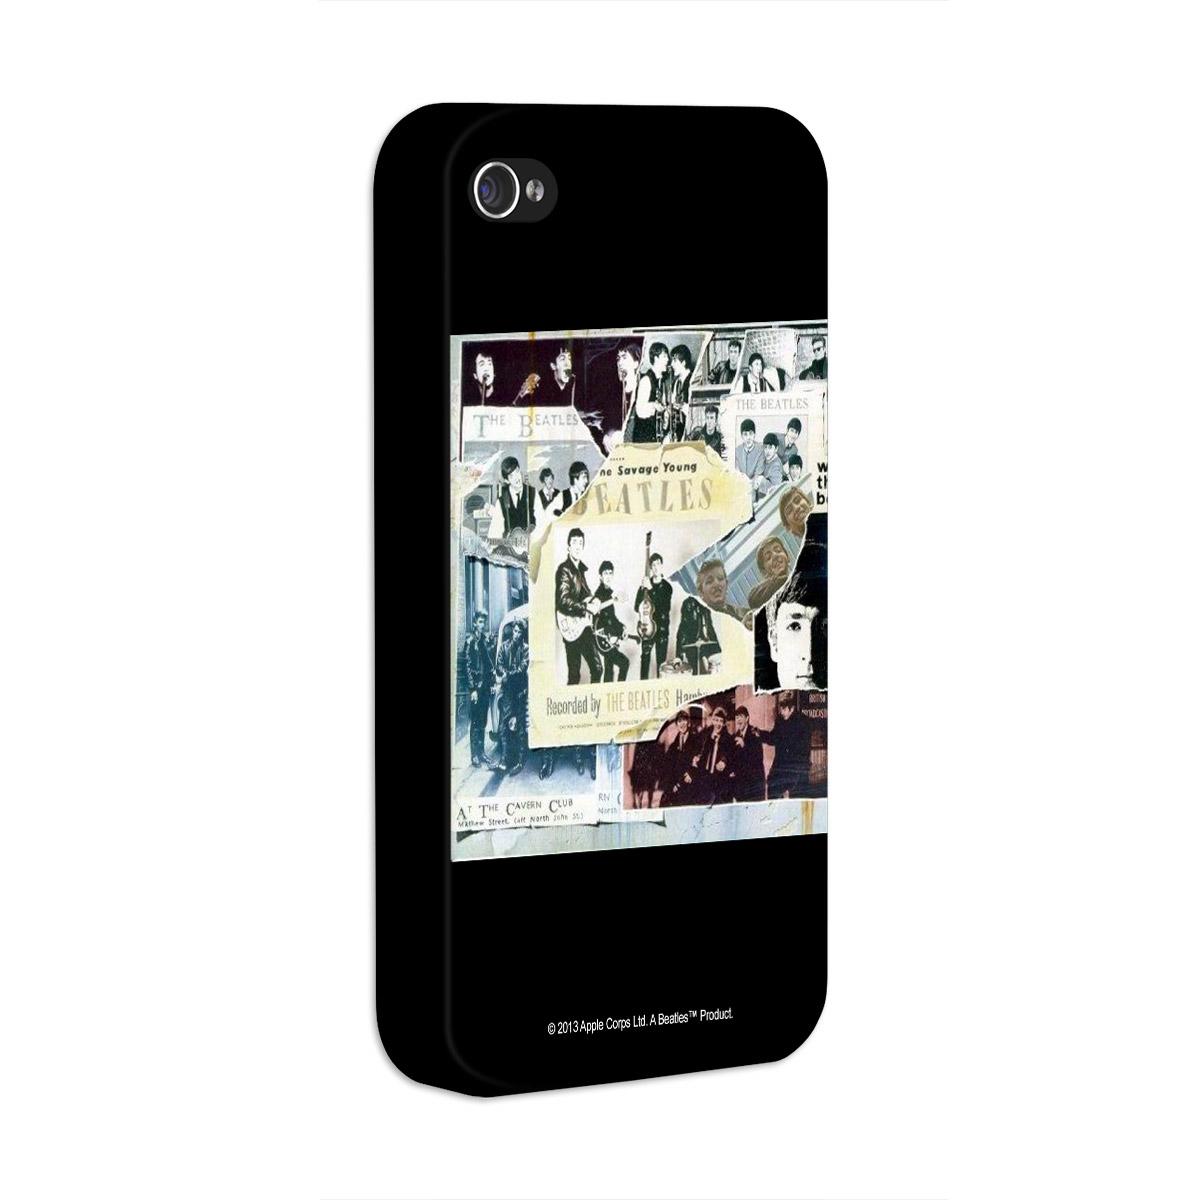 Capa de iPhone 4/4S The Beatles Anthology I